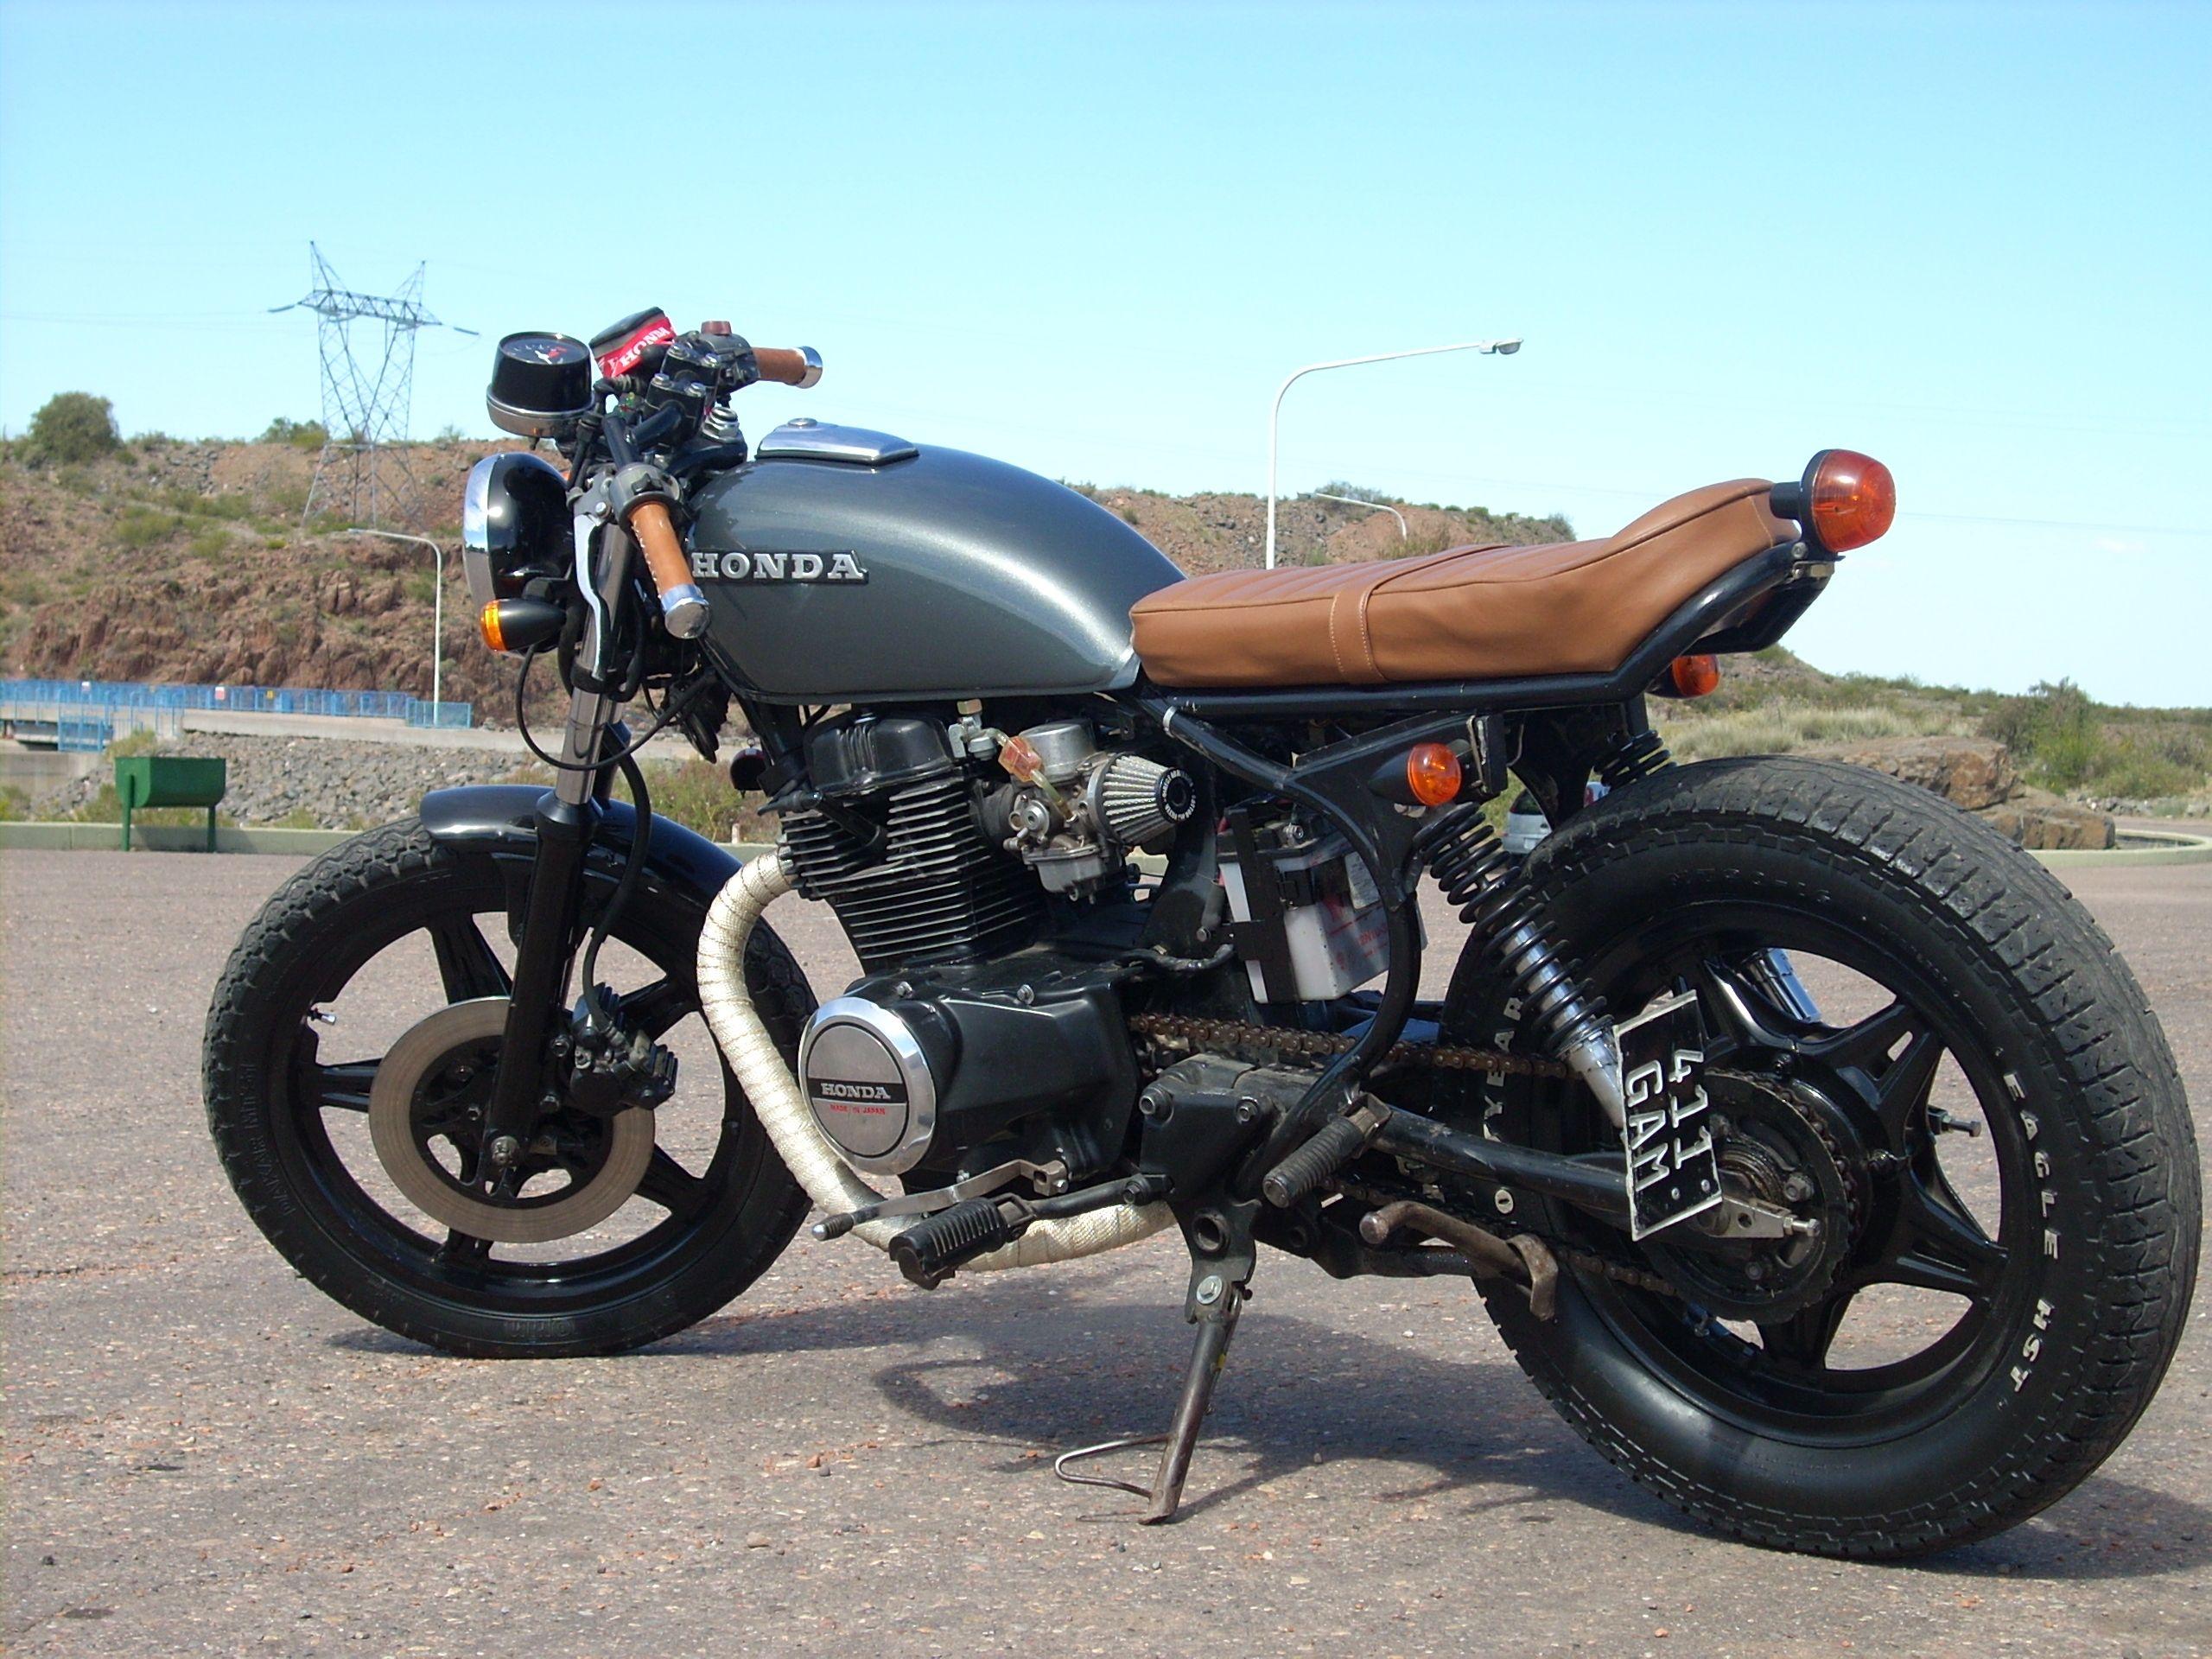 57 best la250 images on pinterest | cafe racers, honda motorcycles